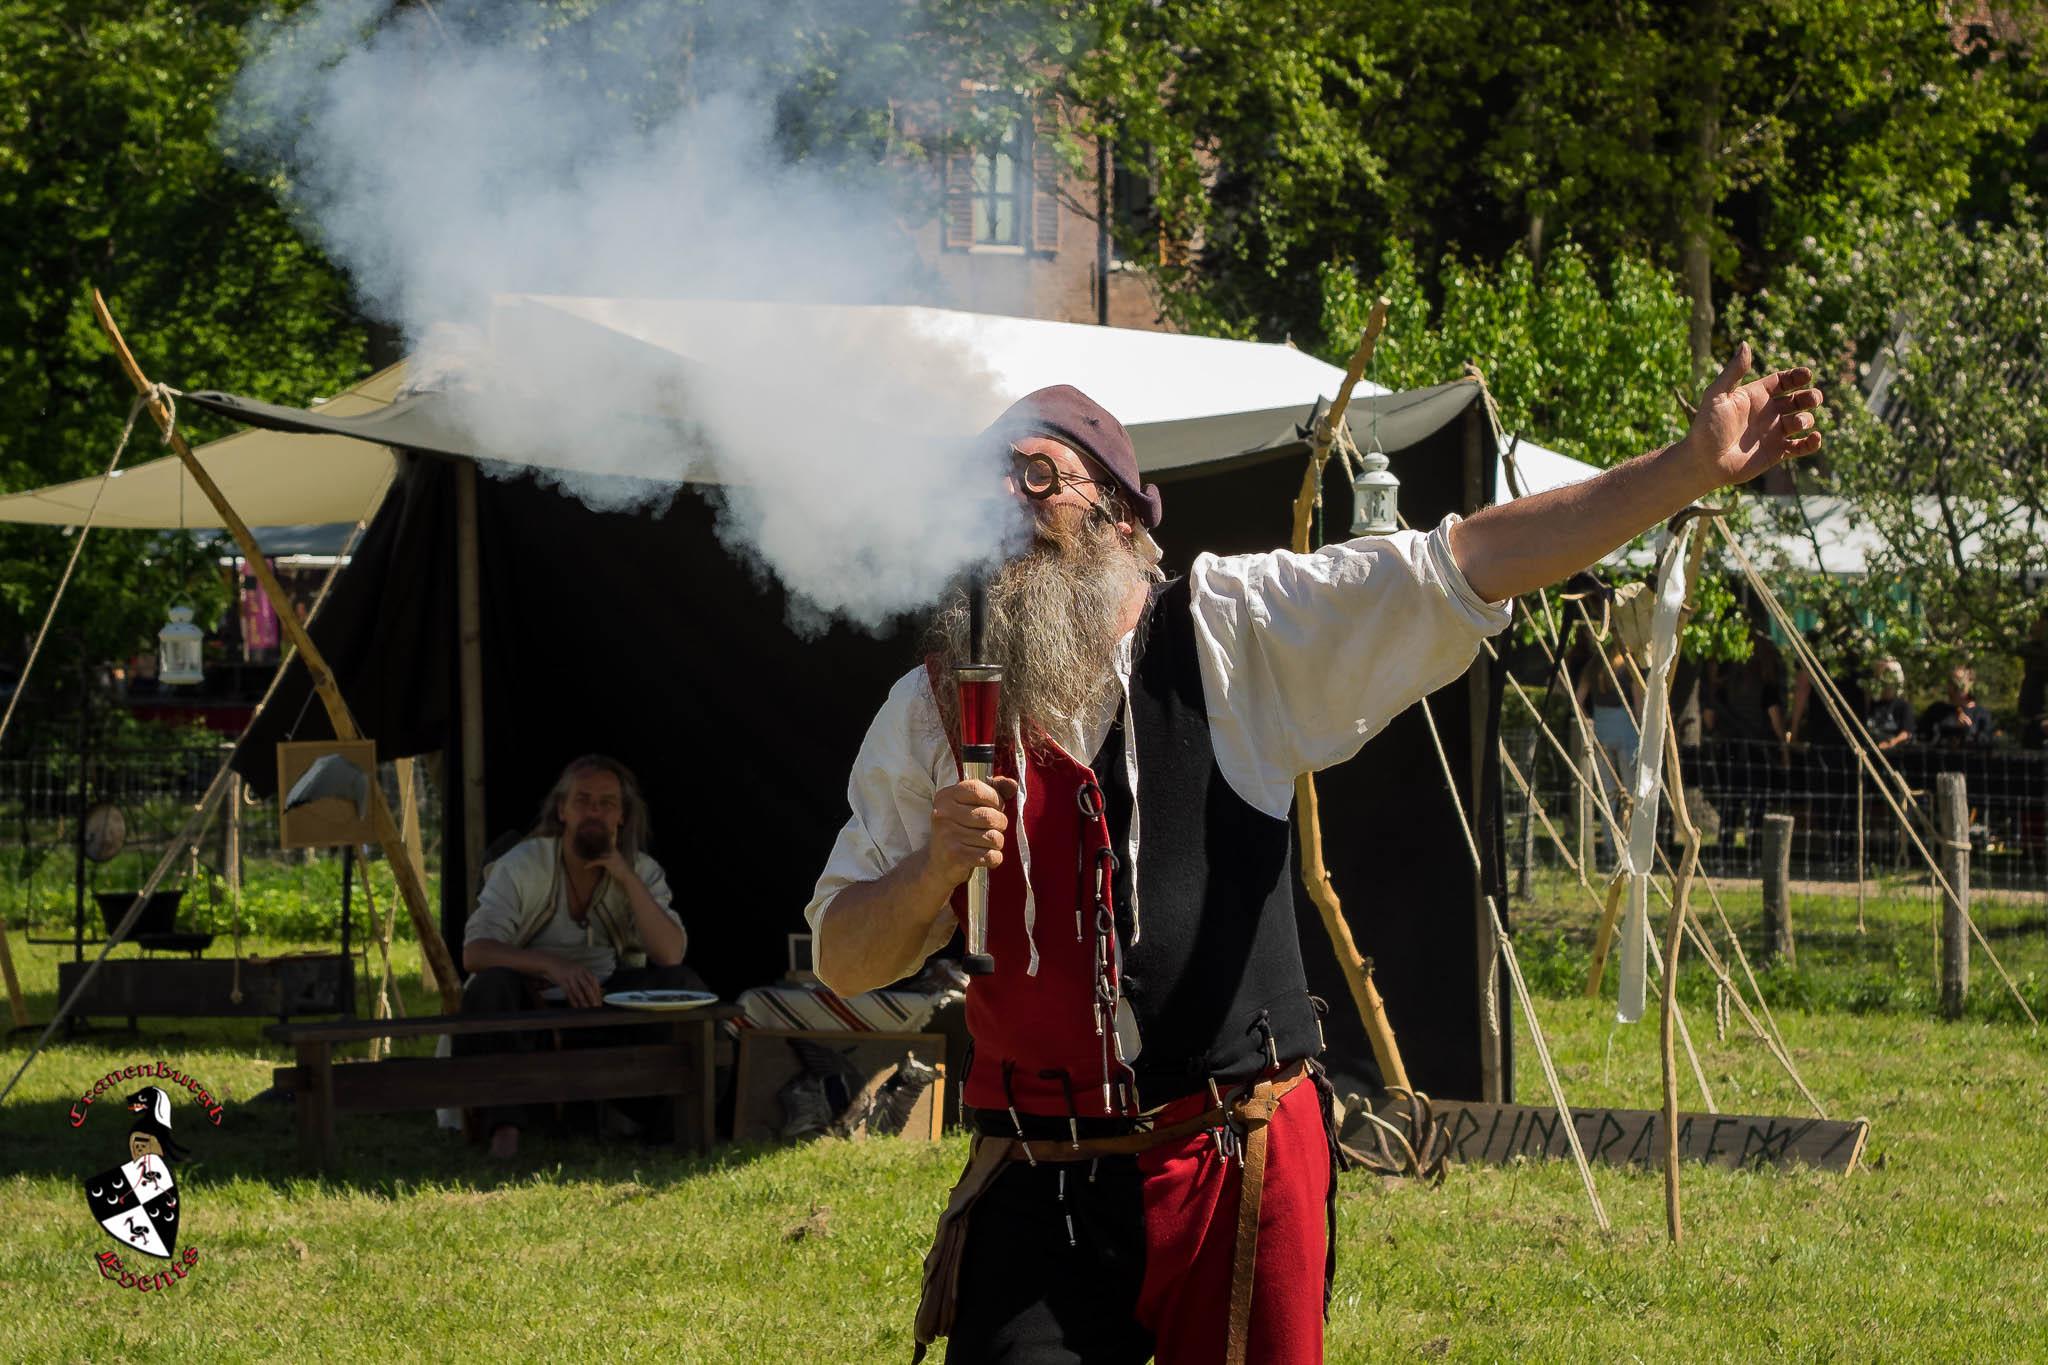 Middeleeuws-Festijn-Cannenburgh-2018-Algemeen-Ellen-la-Faille-21